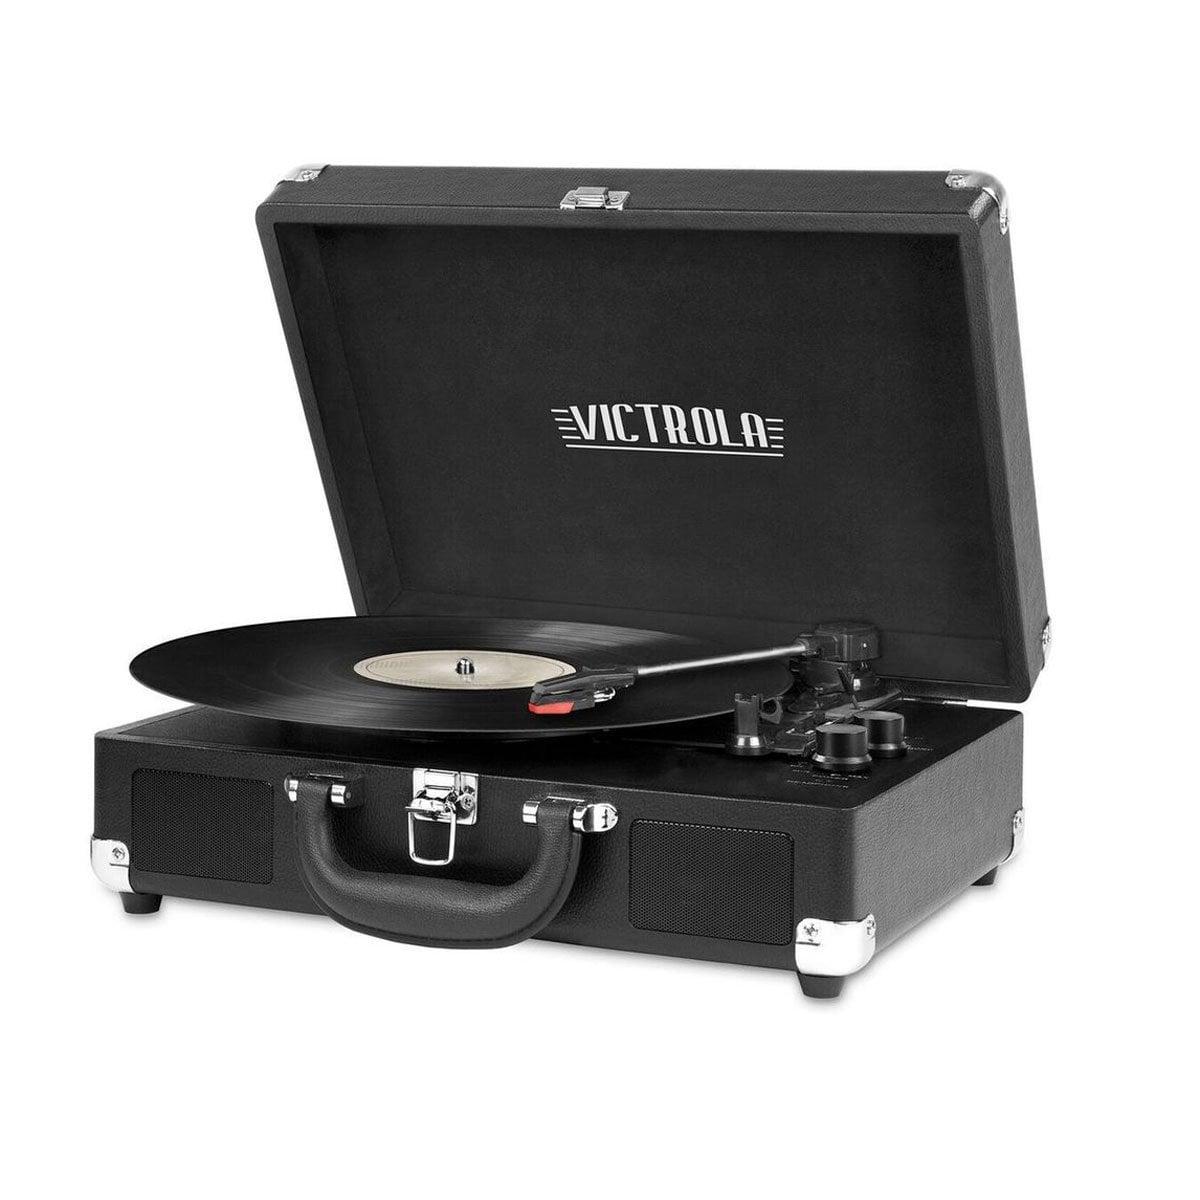 Reproductor Discos de Maleta Negro Victrola